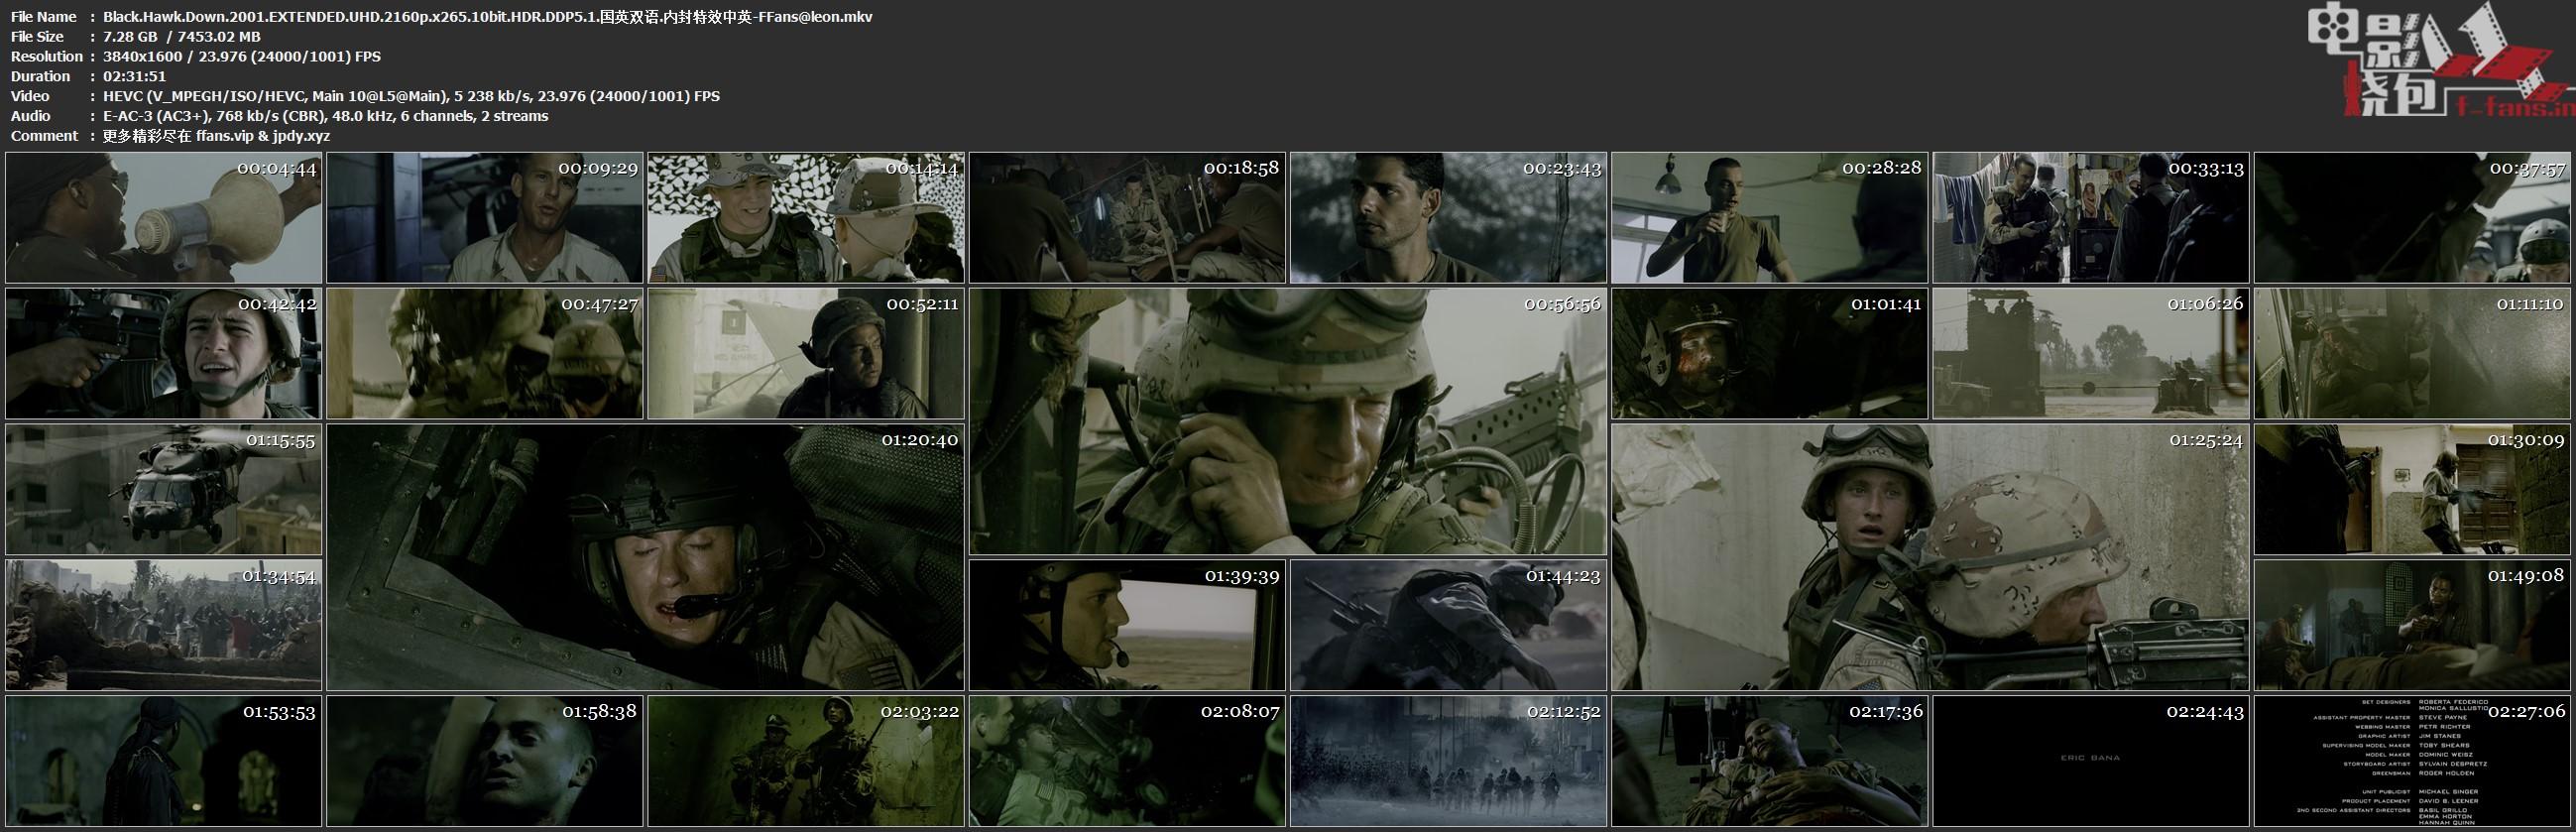 Black.Hawk.Down.2001.EXTENDED.UHD.2160p.x265.10bit.HDR.DDP5.1..-FFansleon.mkv.jpg